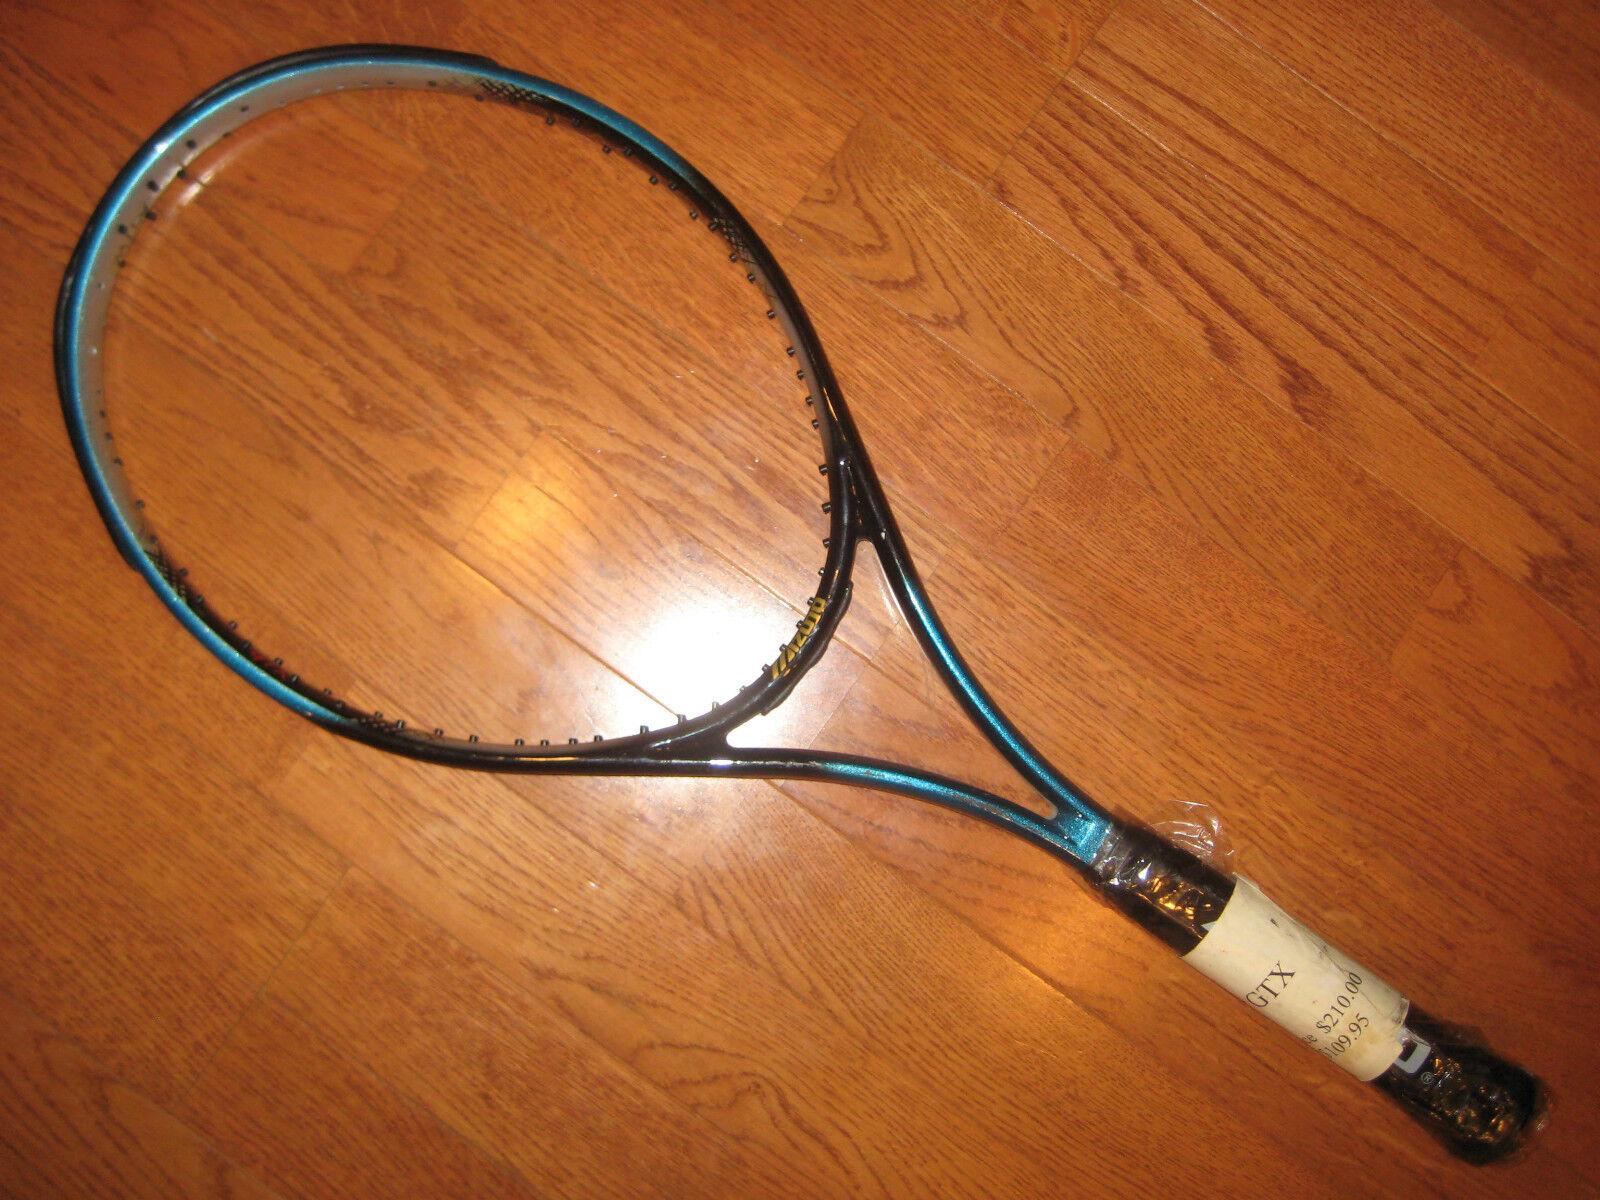 Reactor de Mizuno GTX Raqueta De Tenis -  totalmente Nuevo  - 4 3 8